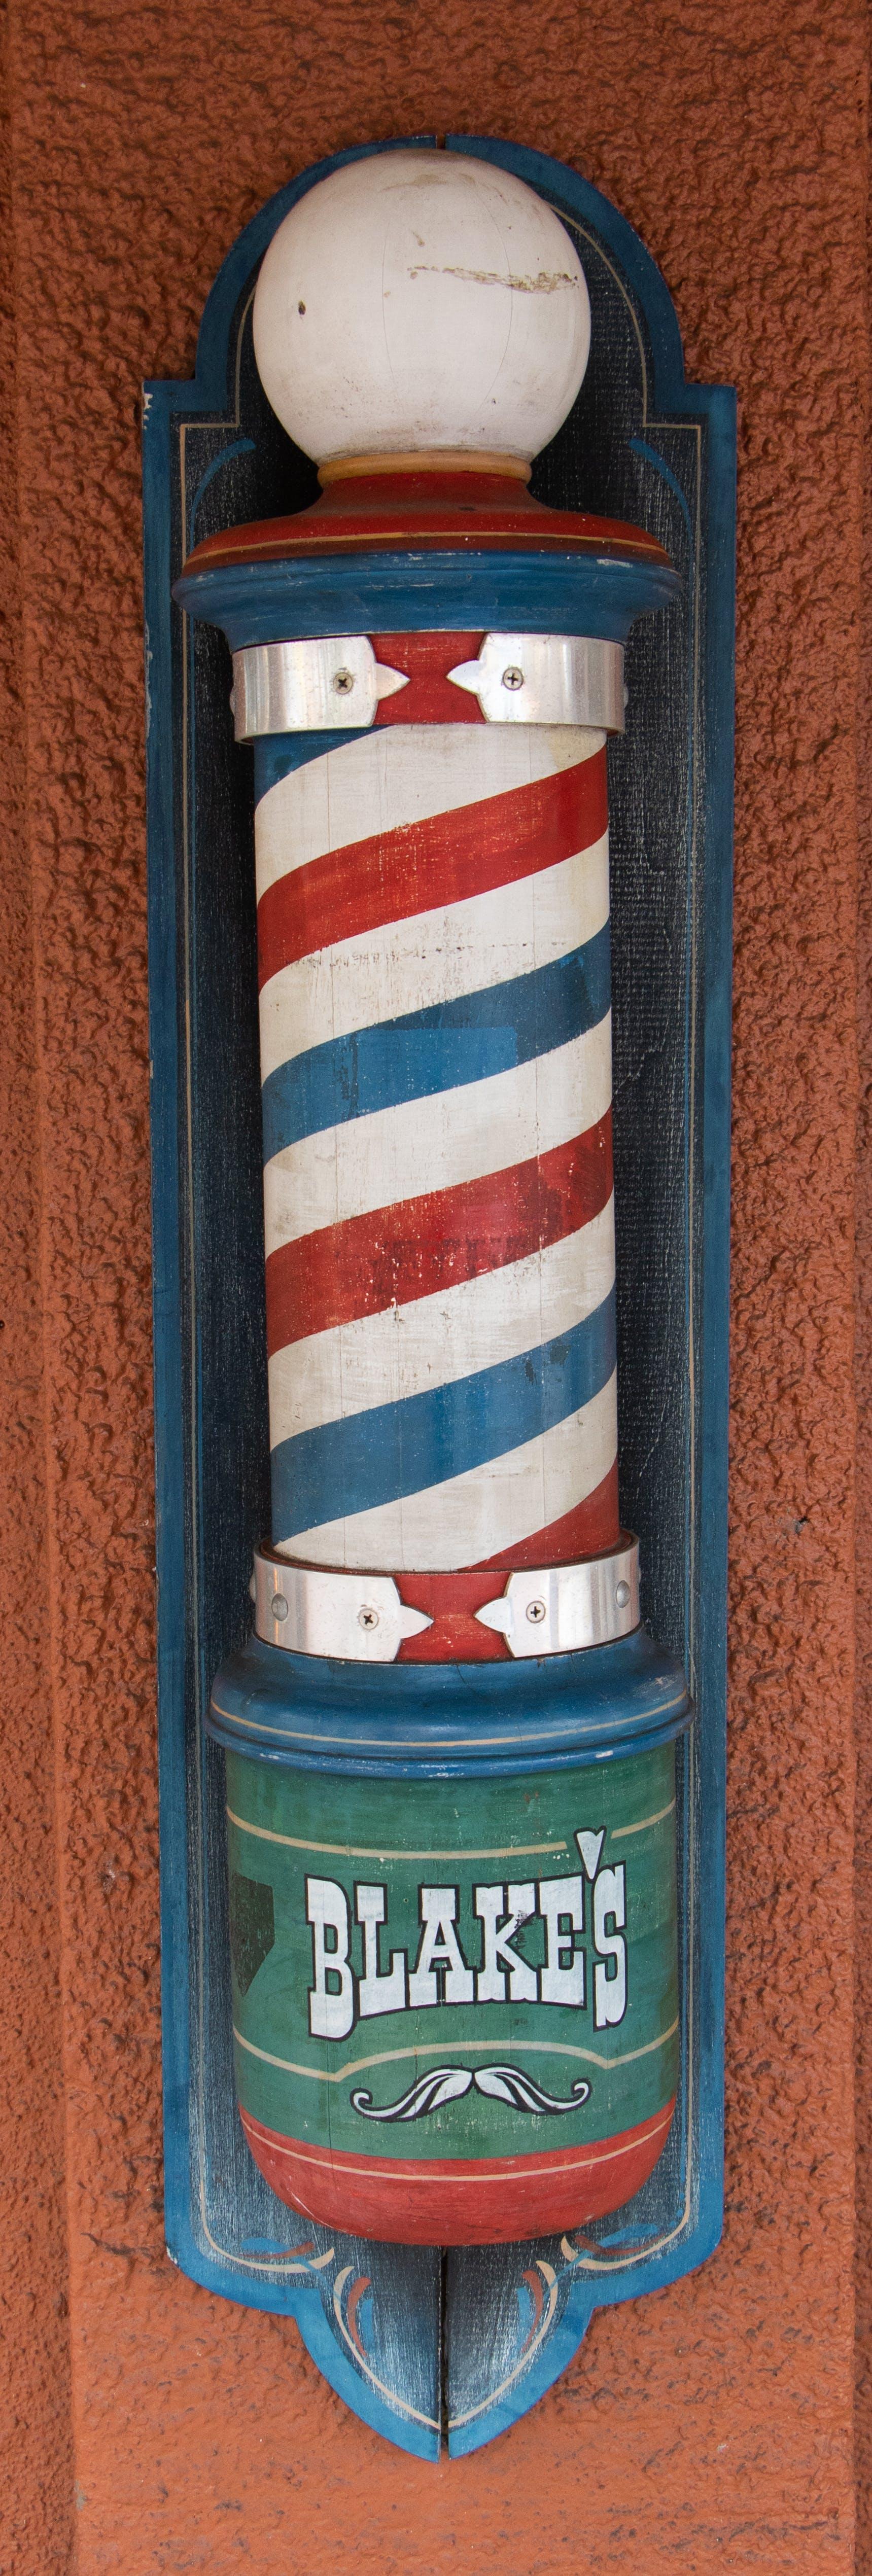 Free stock photo of barbershop, poll